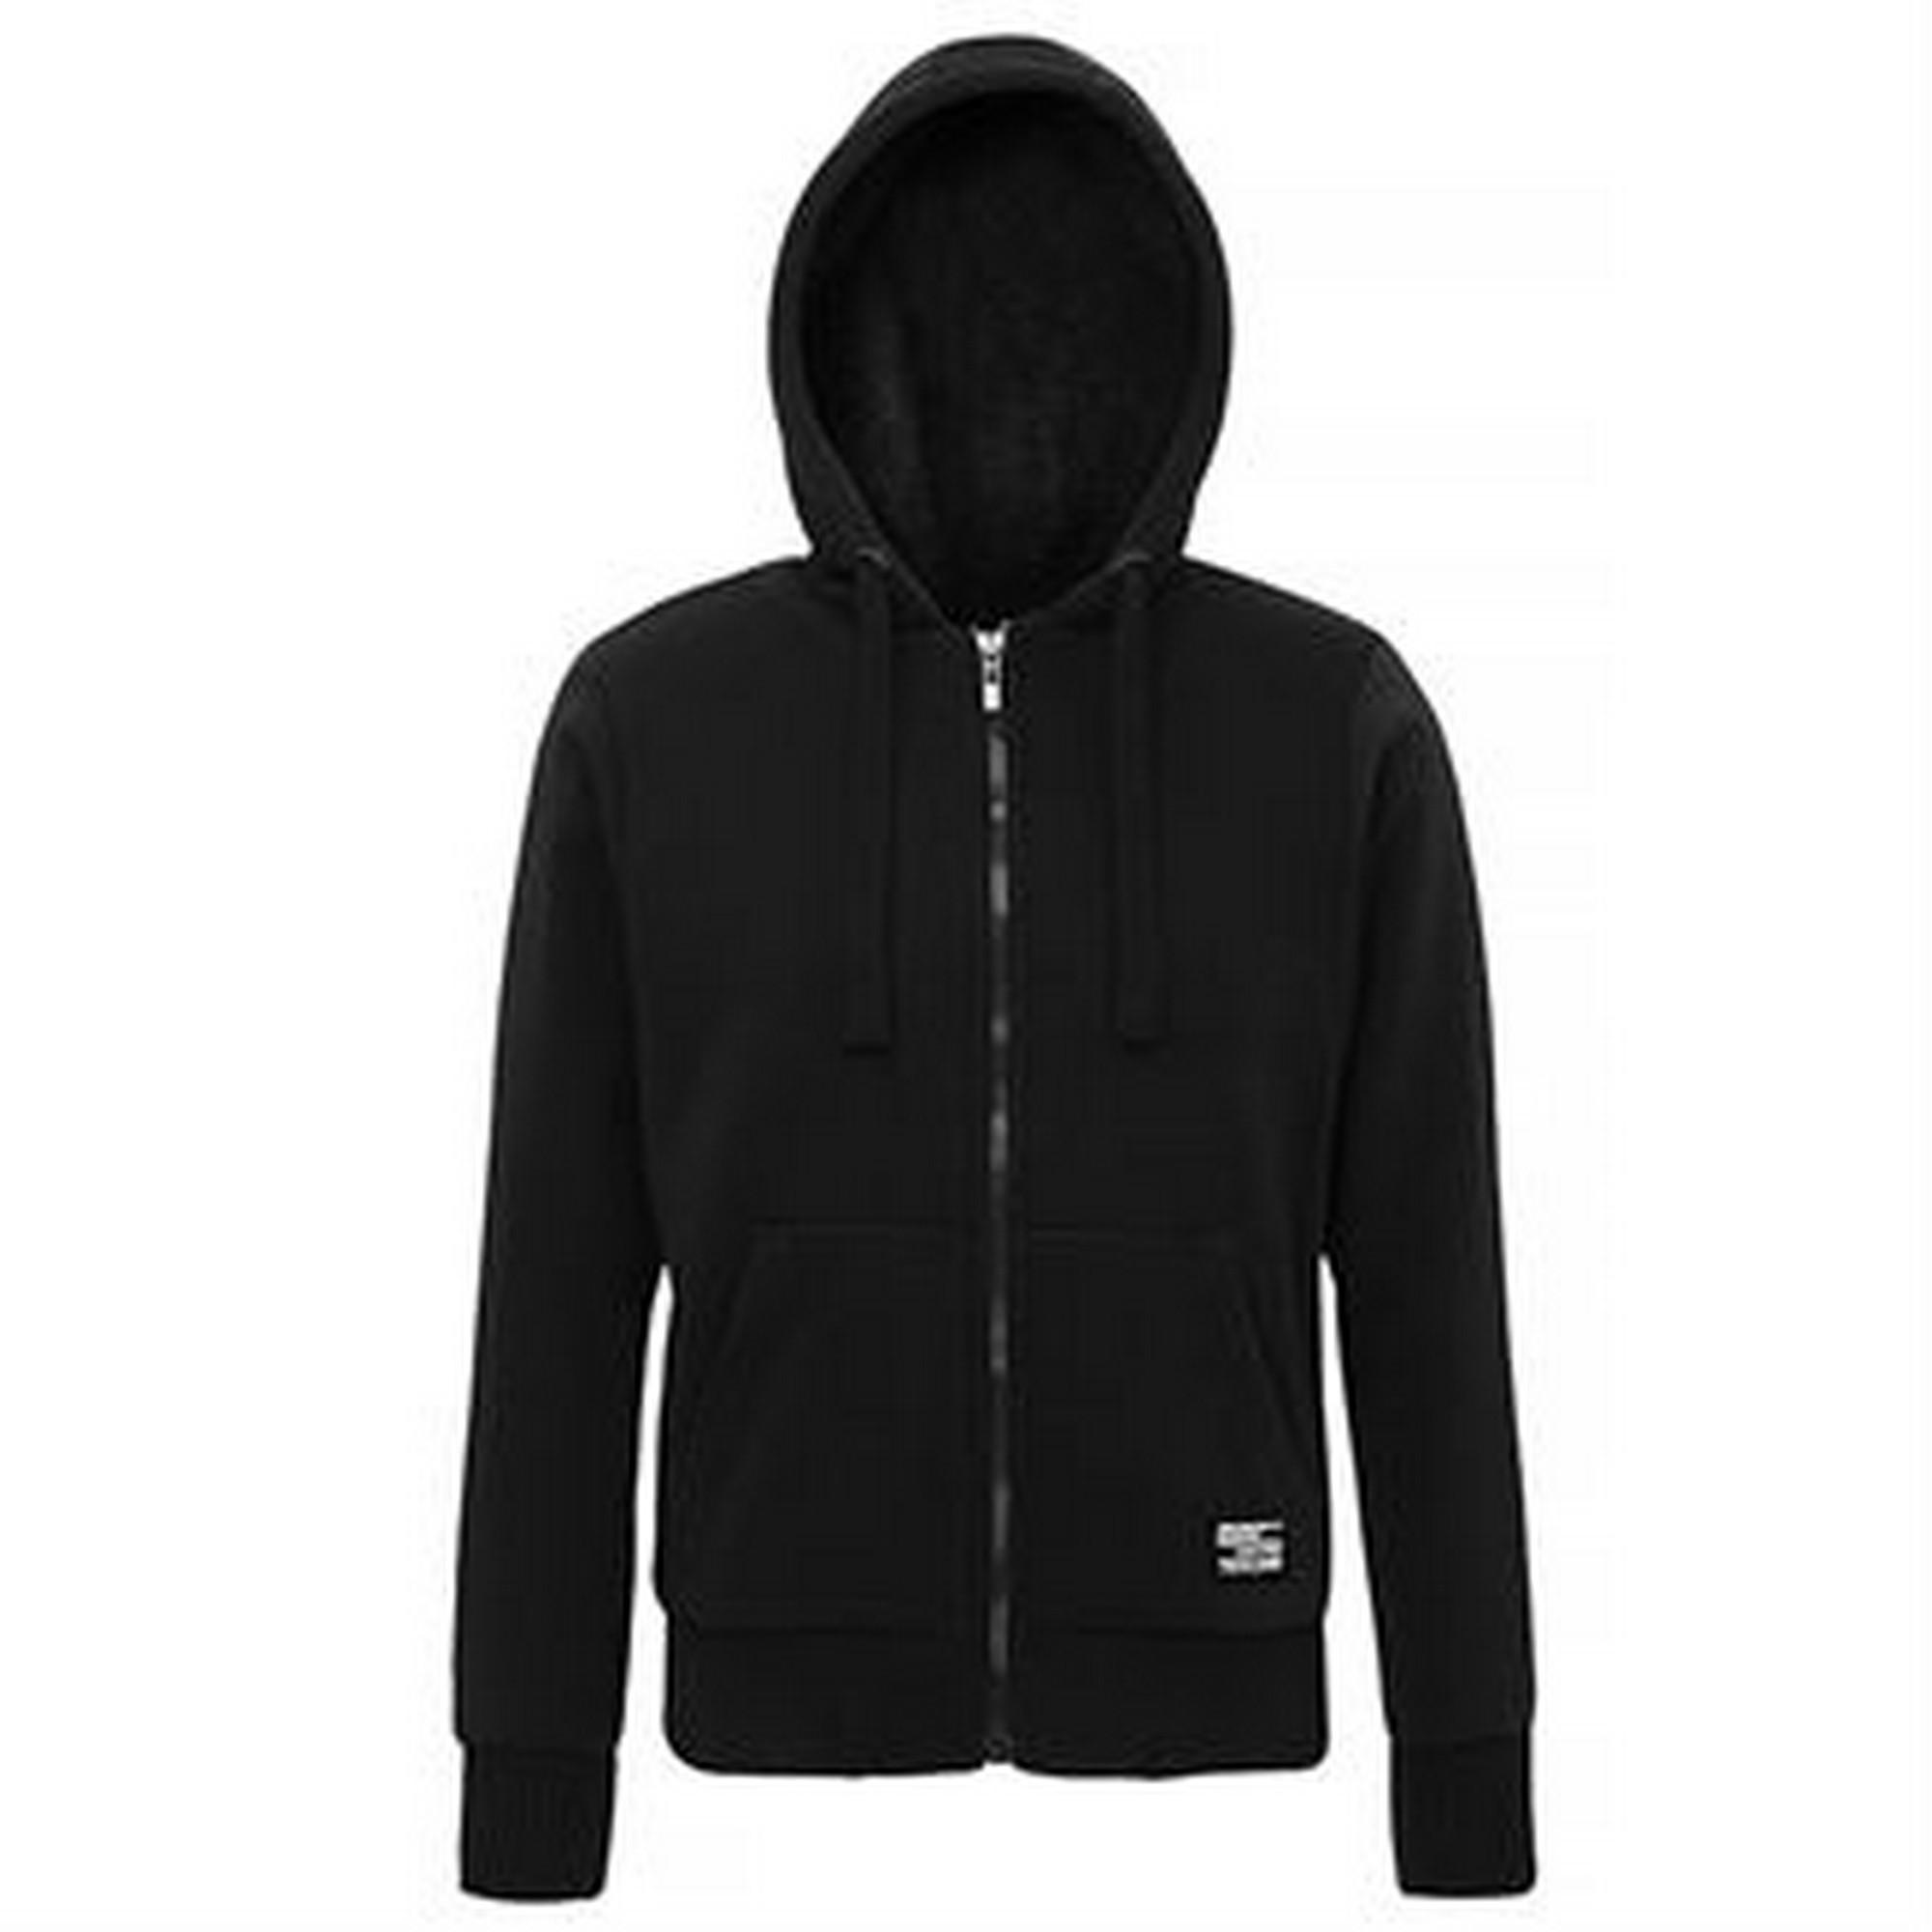 Sherpa fleece hoodie